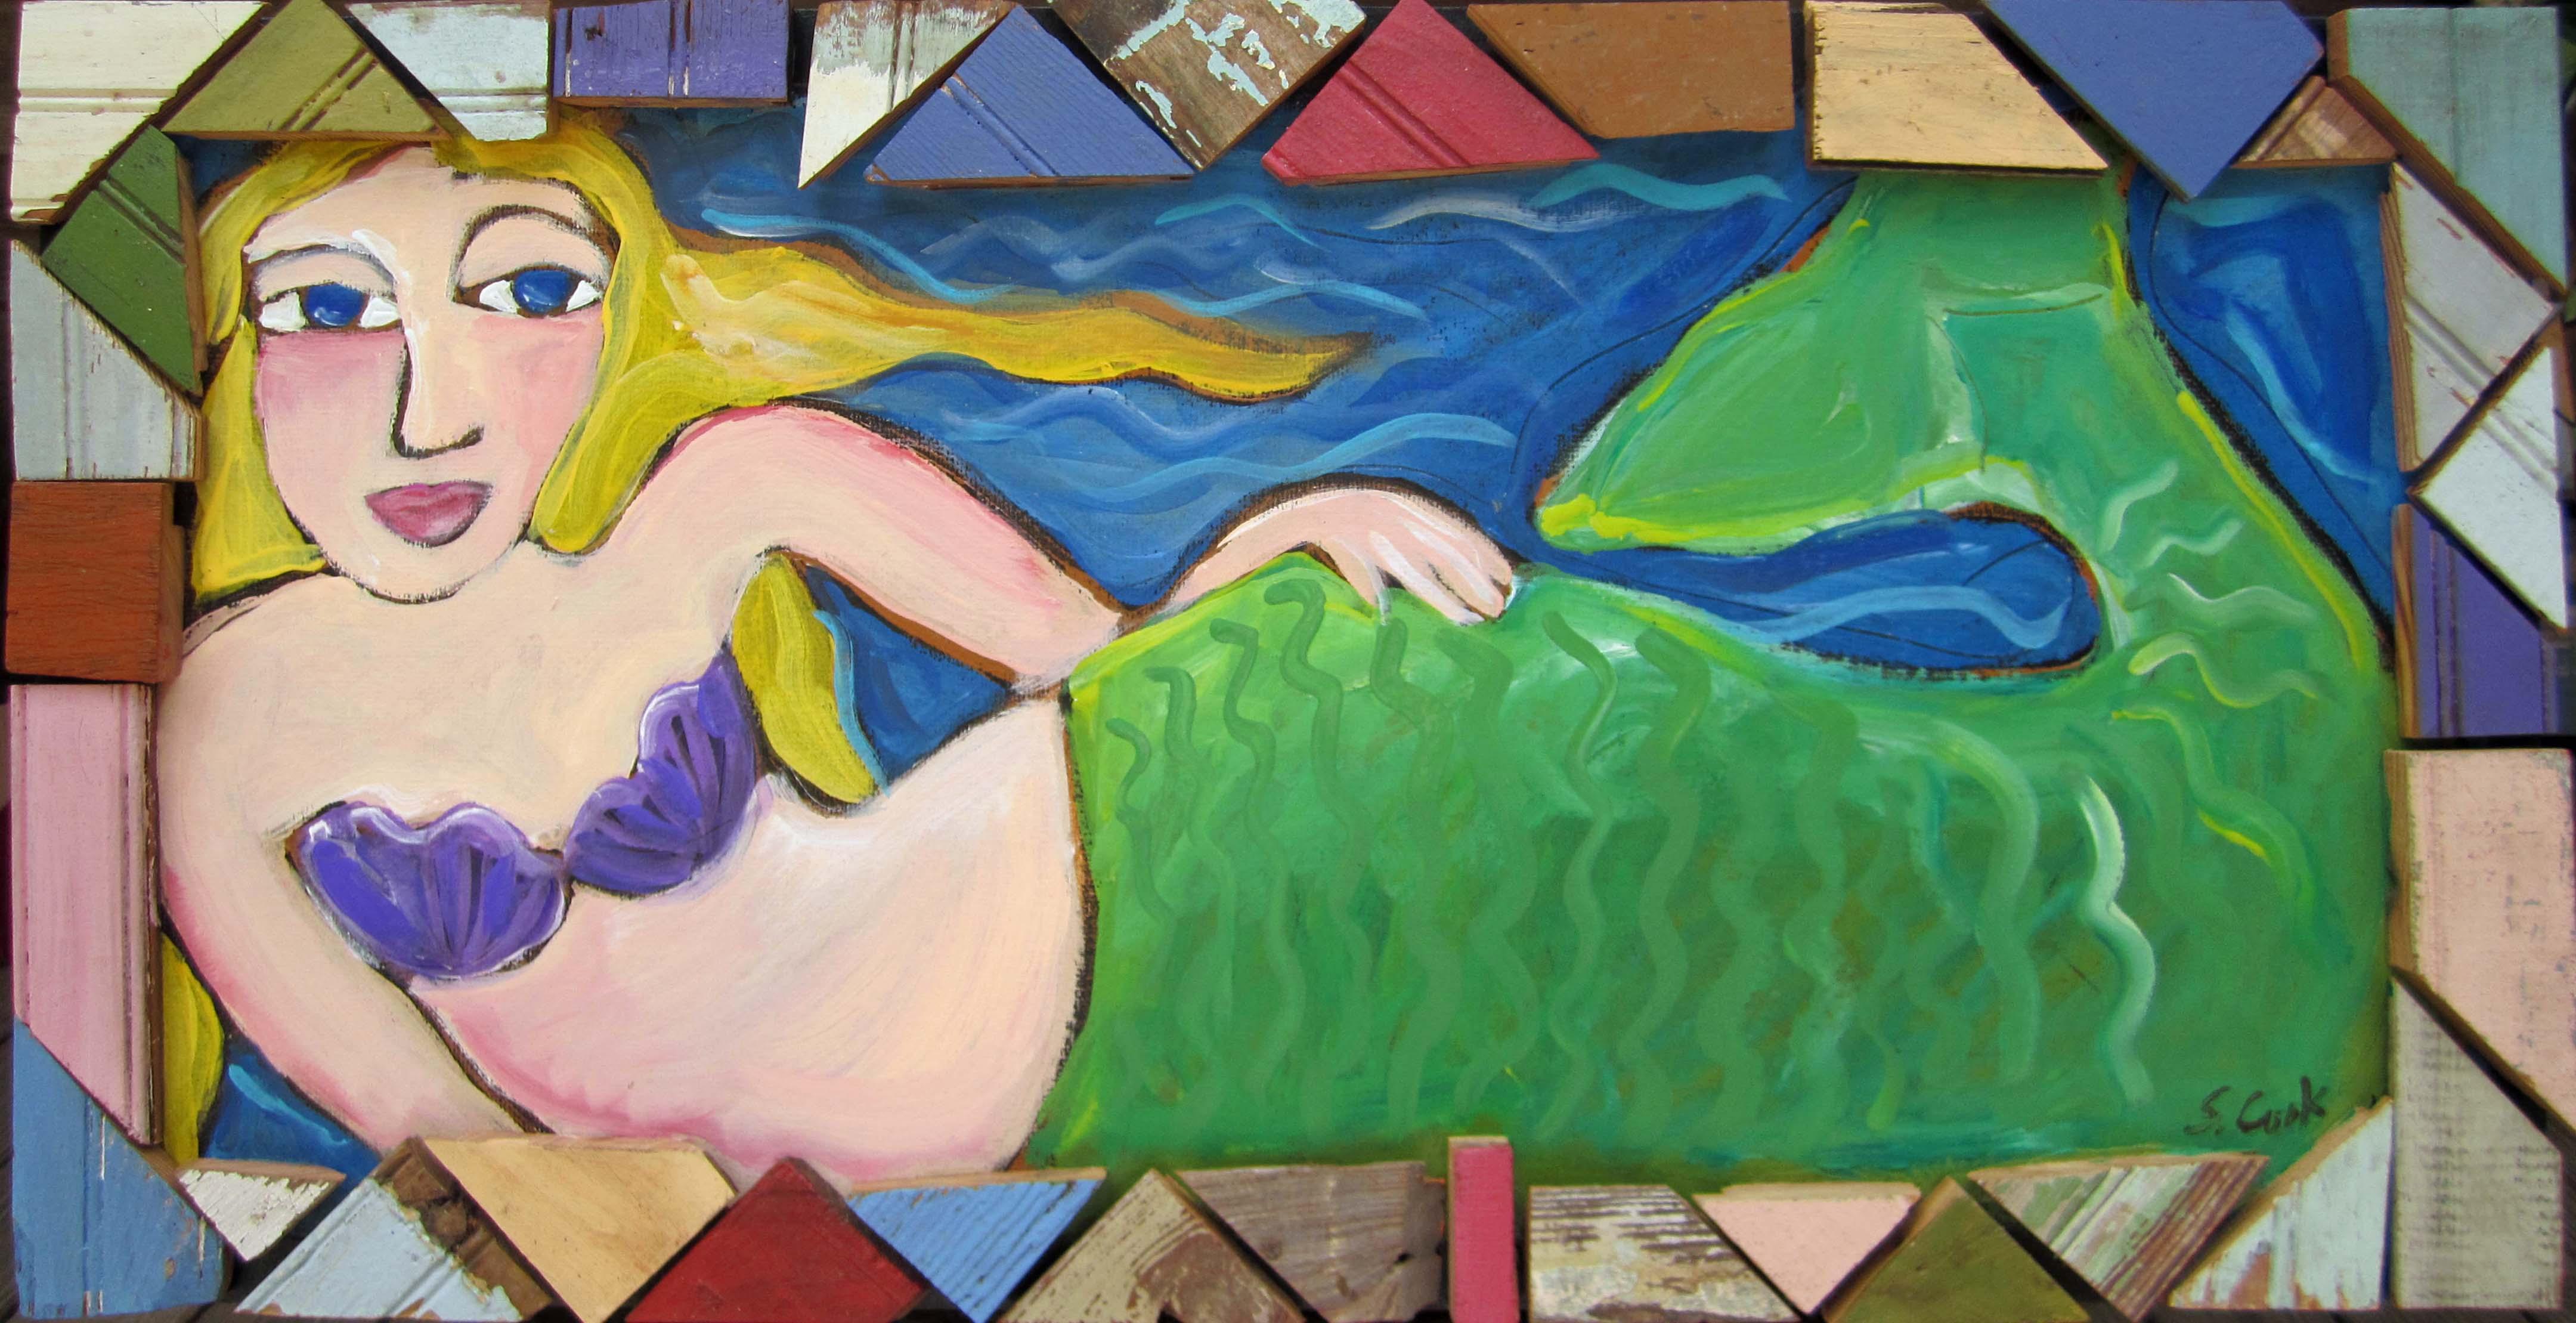 Mermaid 20x36